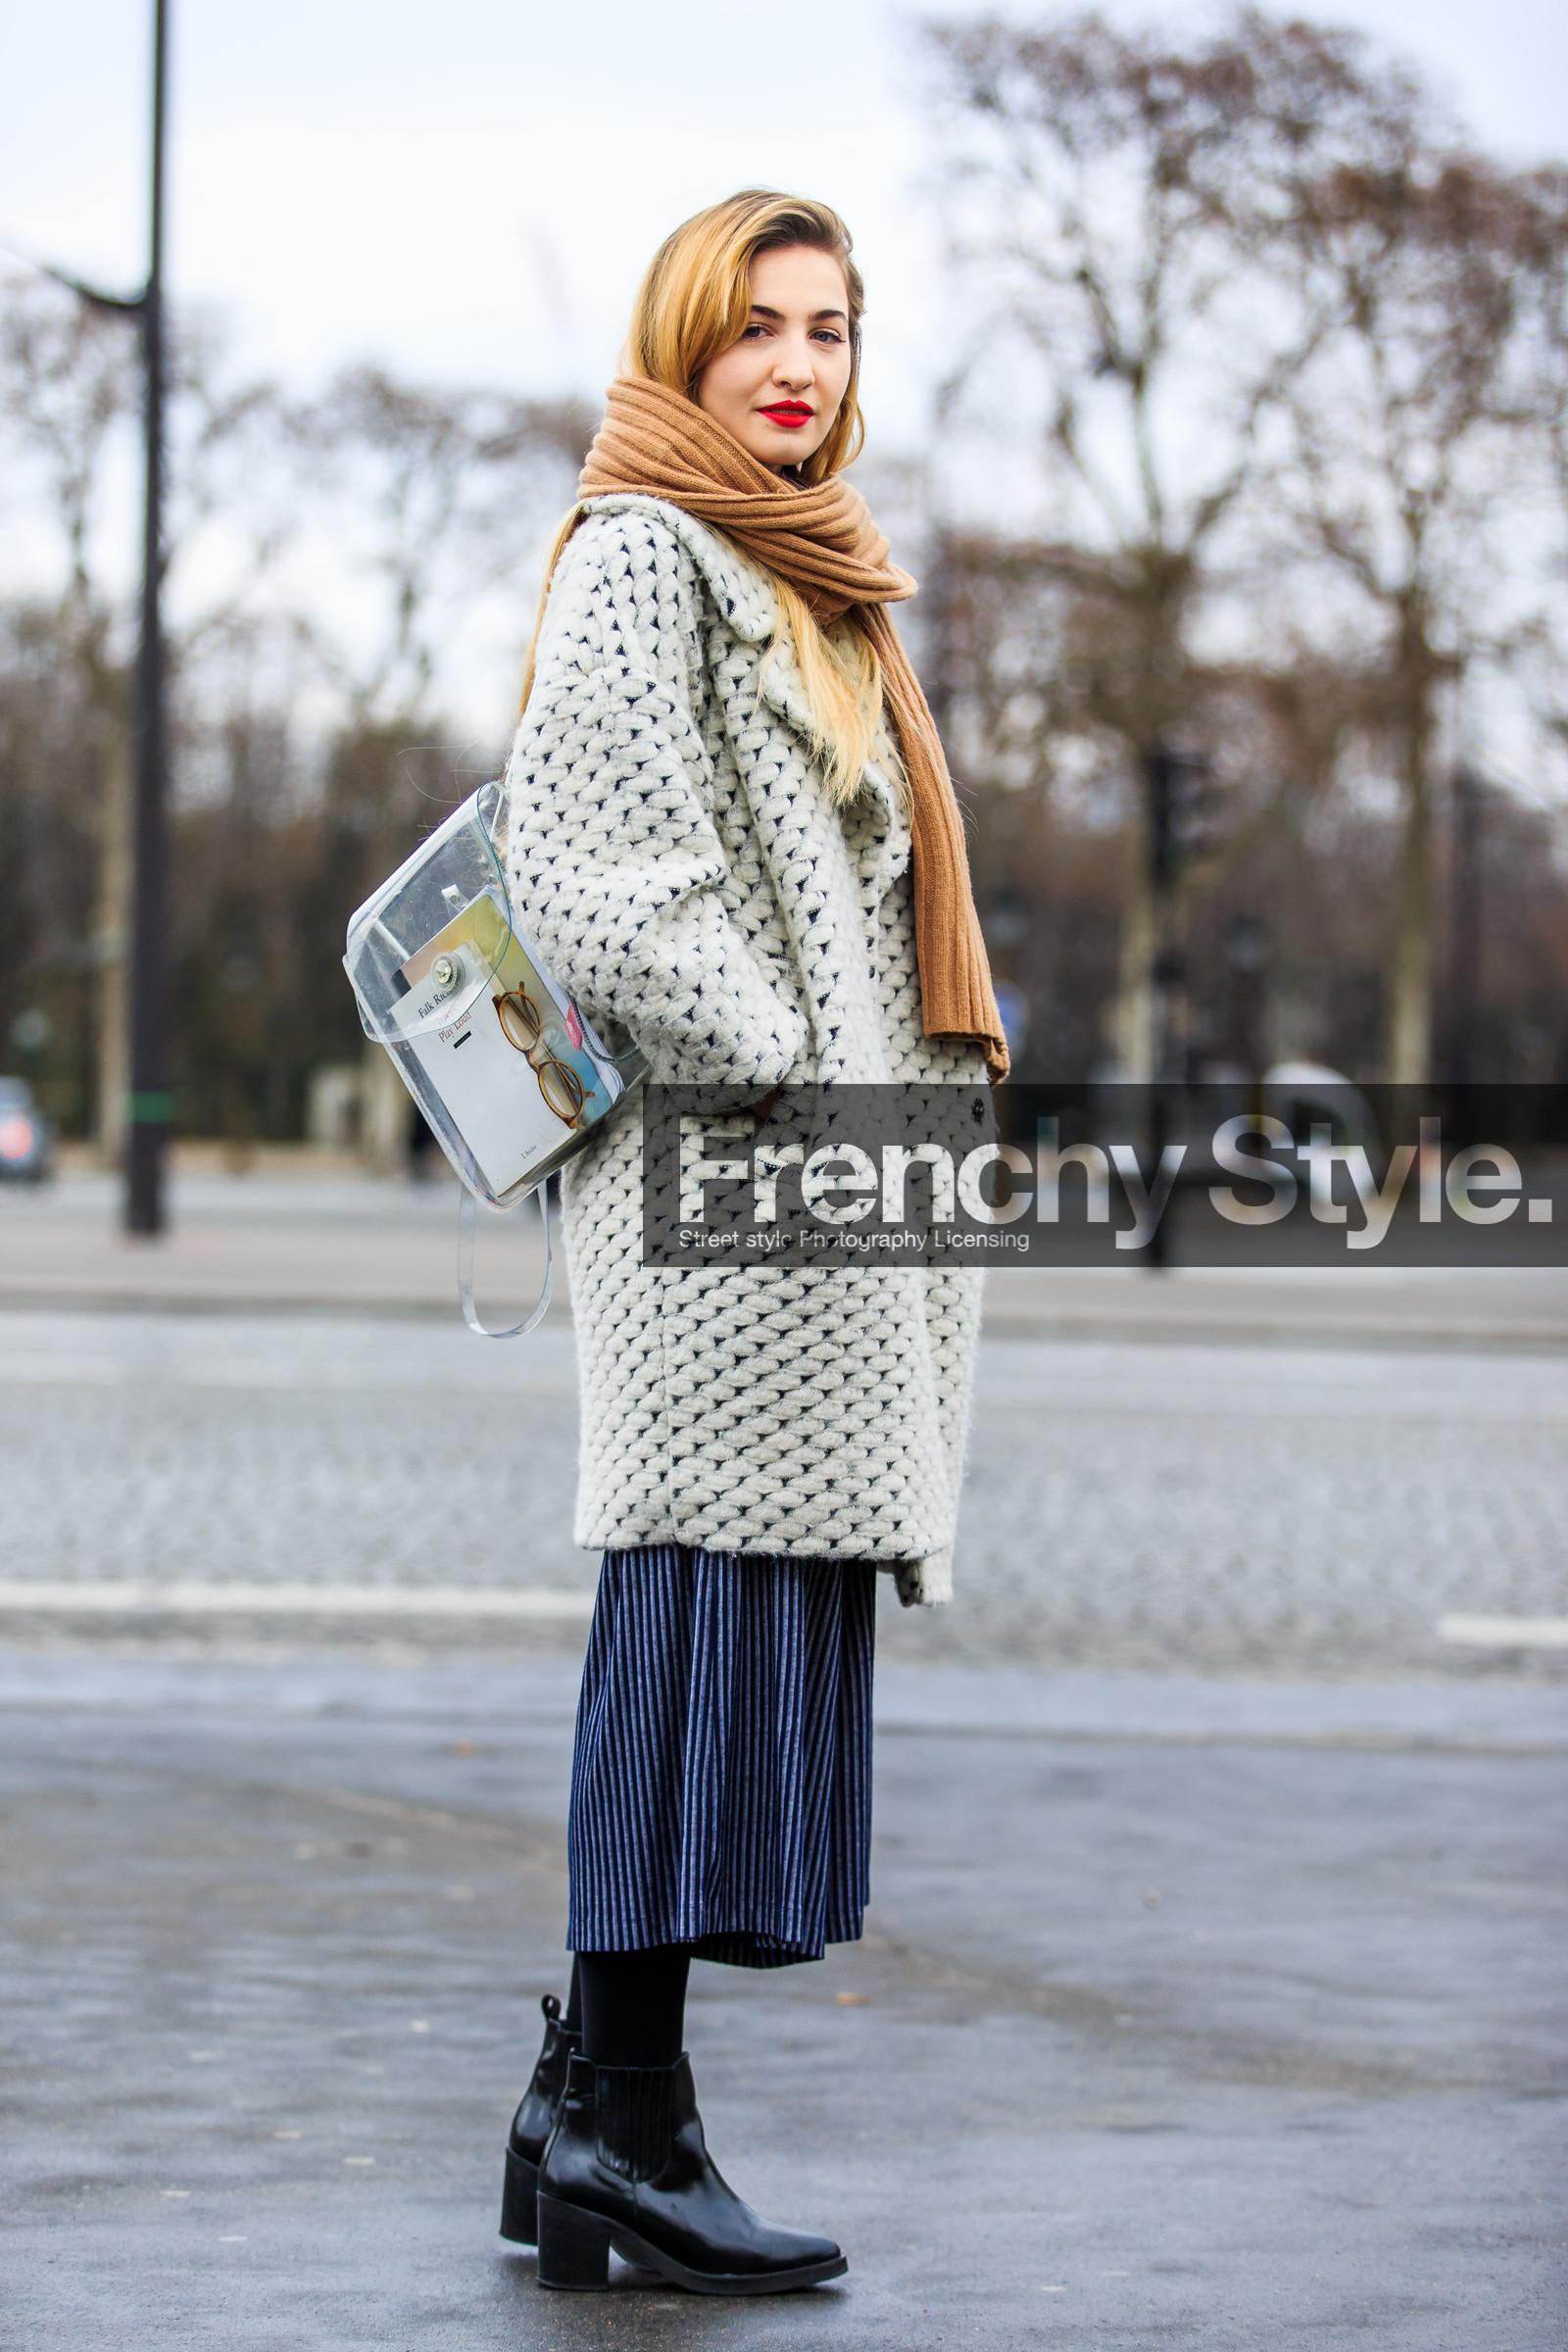 1601P0243.jpg | Frenchy Style